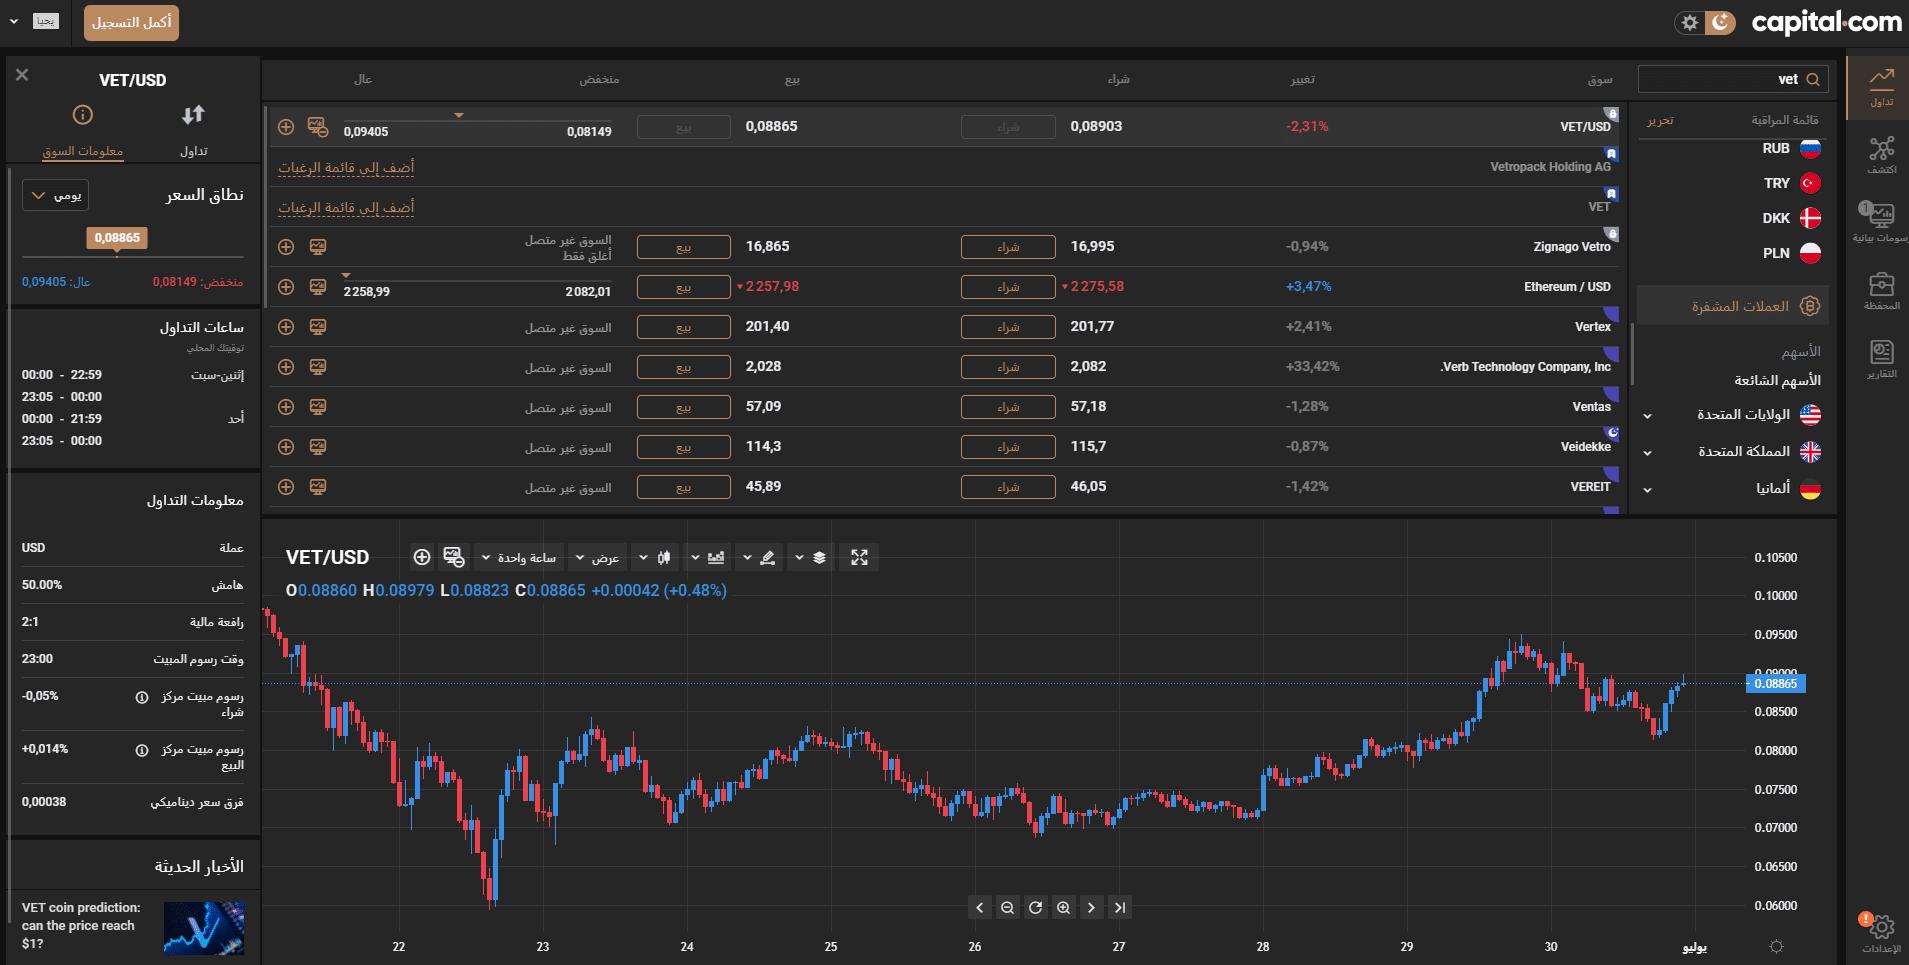 شراء فيتشاين Capital.com